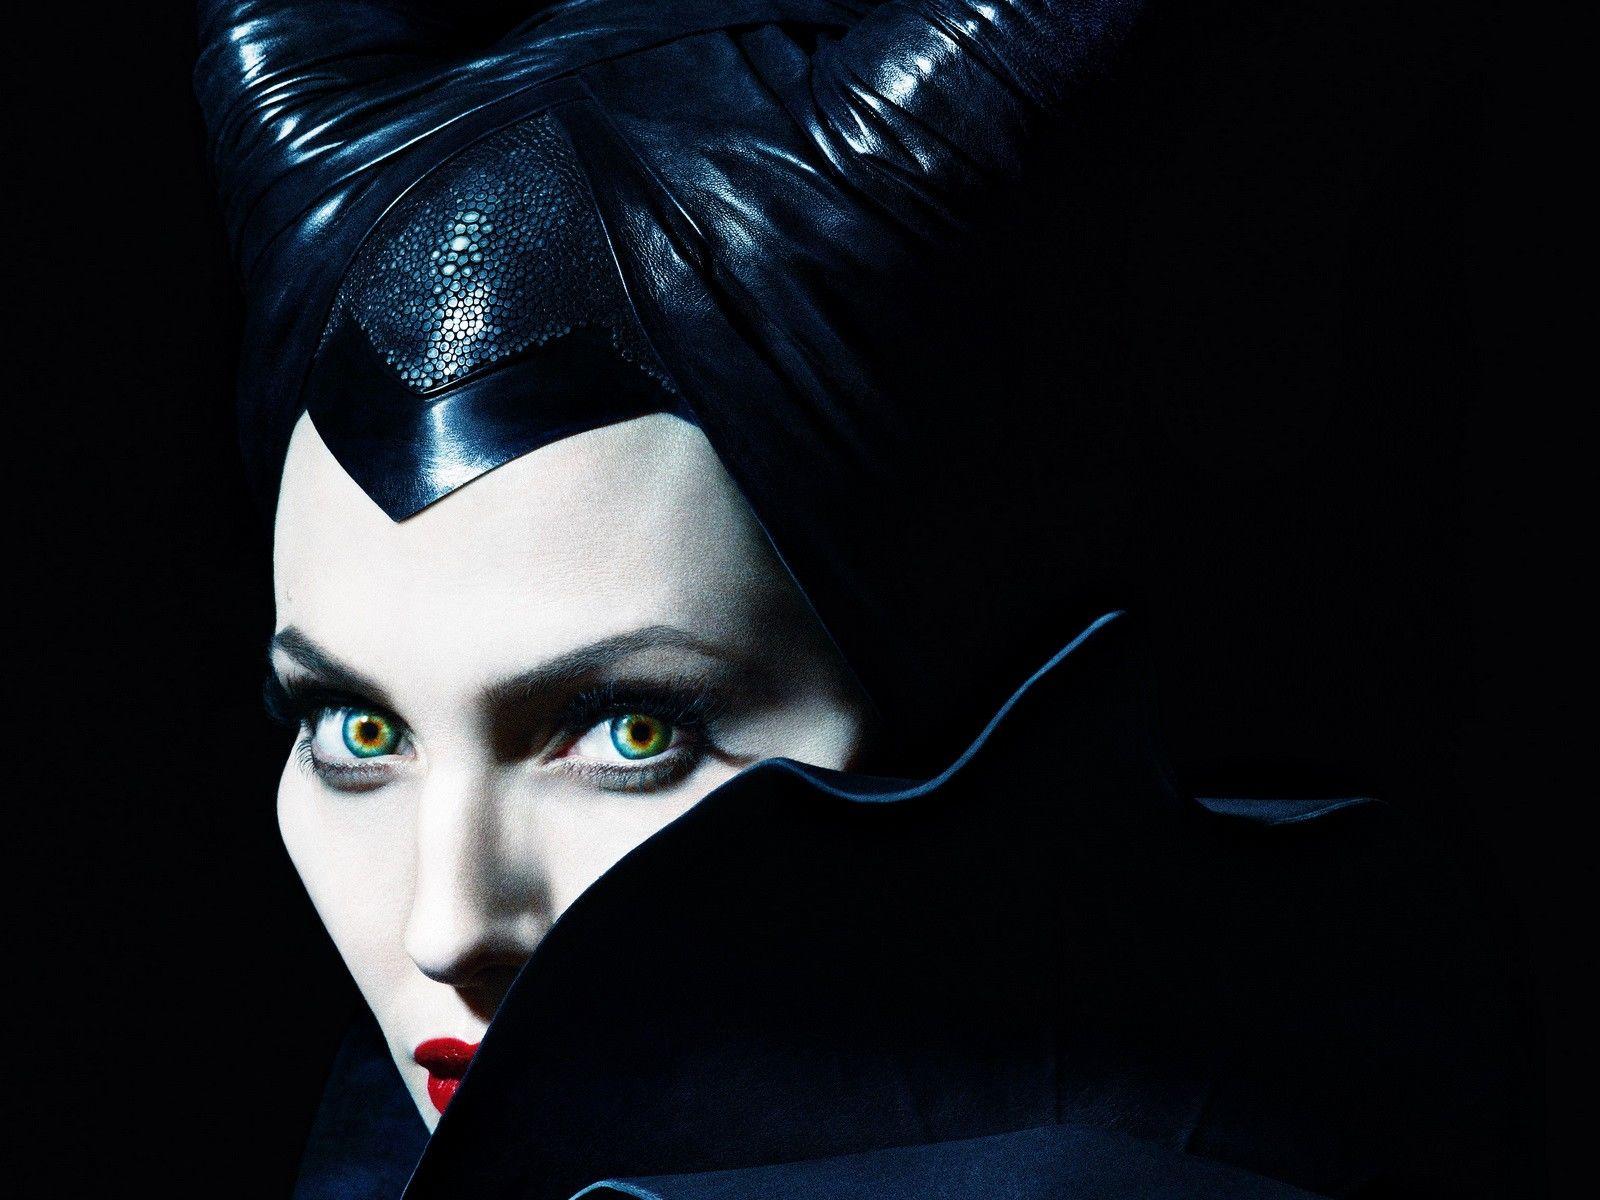 maleficent Angelina movie jolie